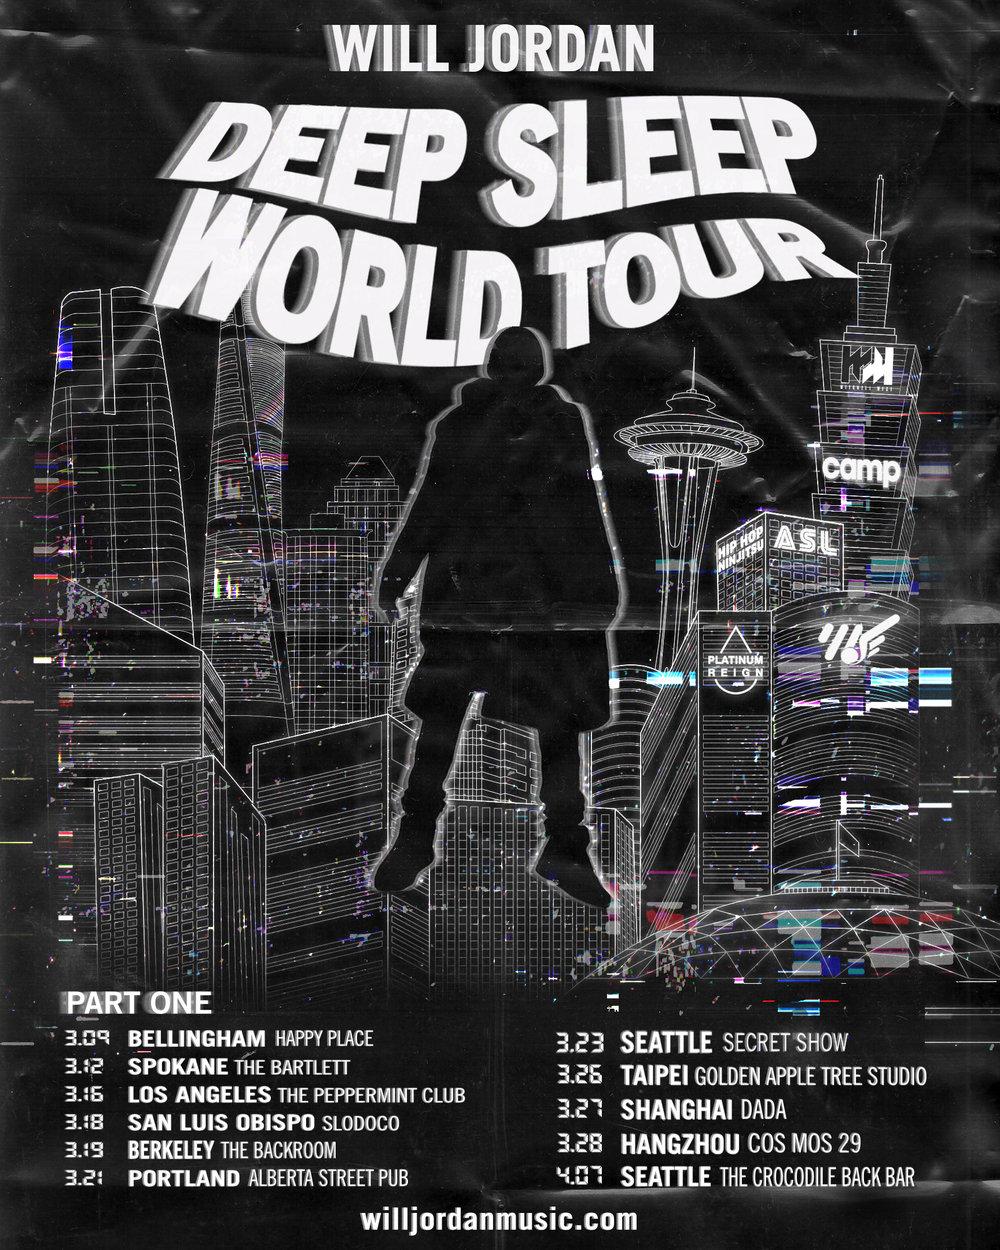 2-06 FINAL tour poster instagram.jpg